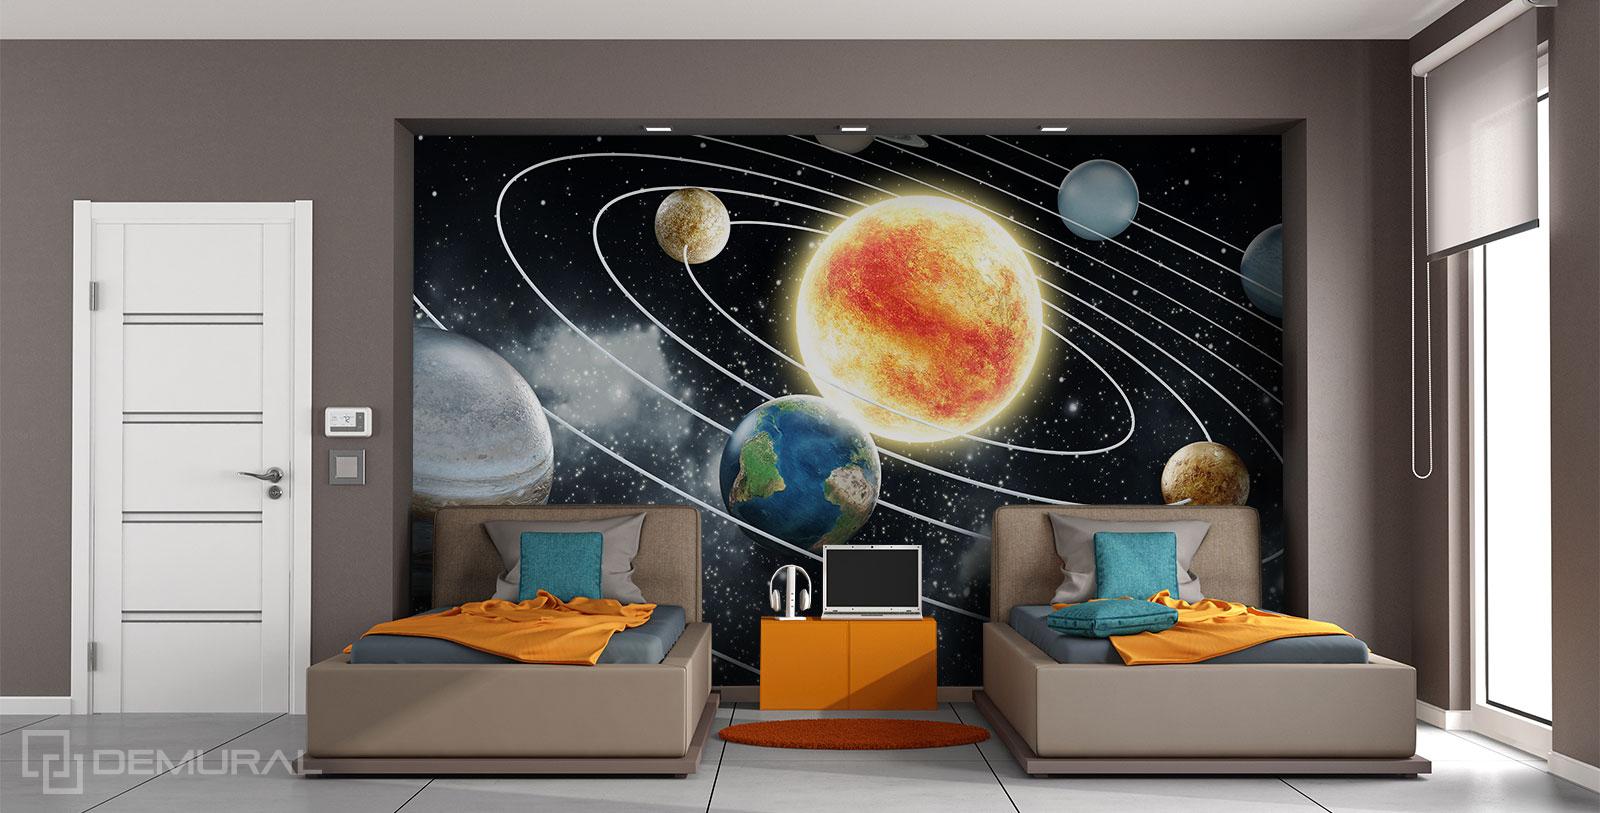 Photo wallaper Private Galaxy - Photo wallpaper cosmos - Demural